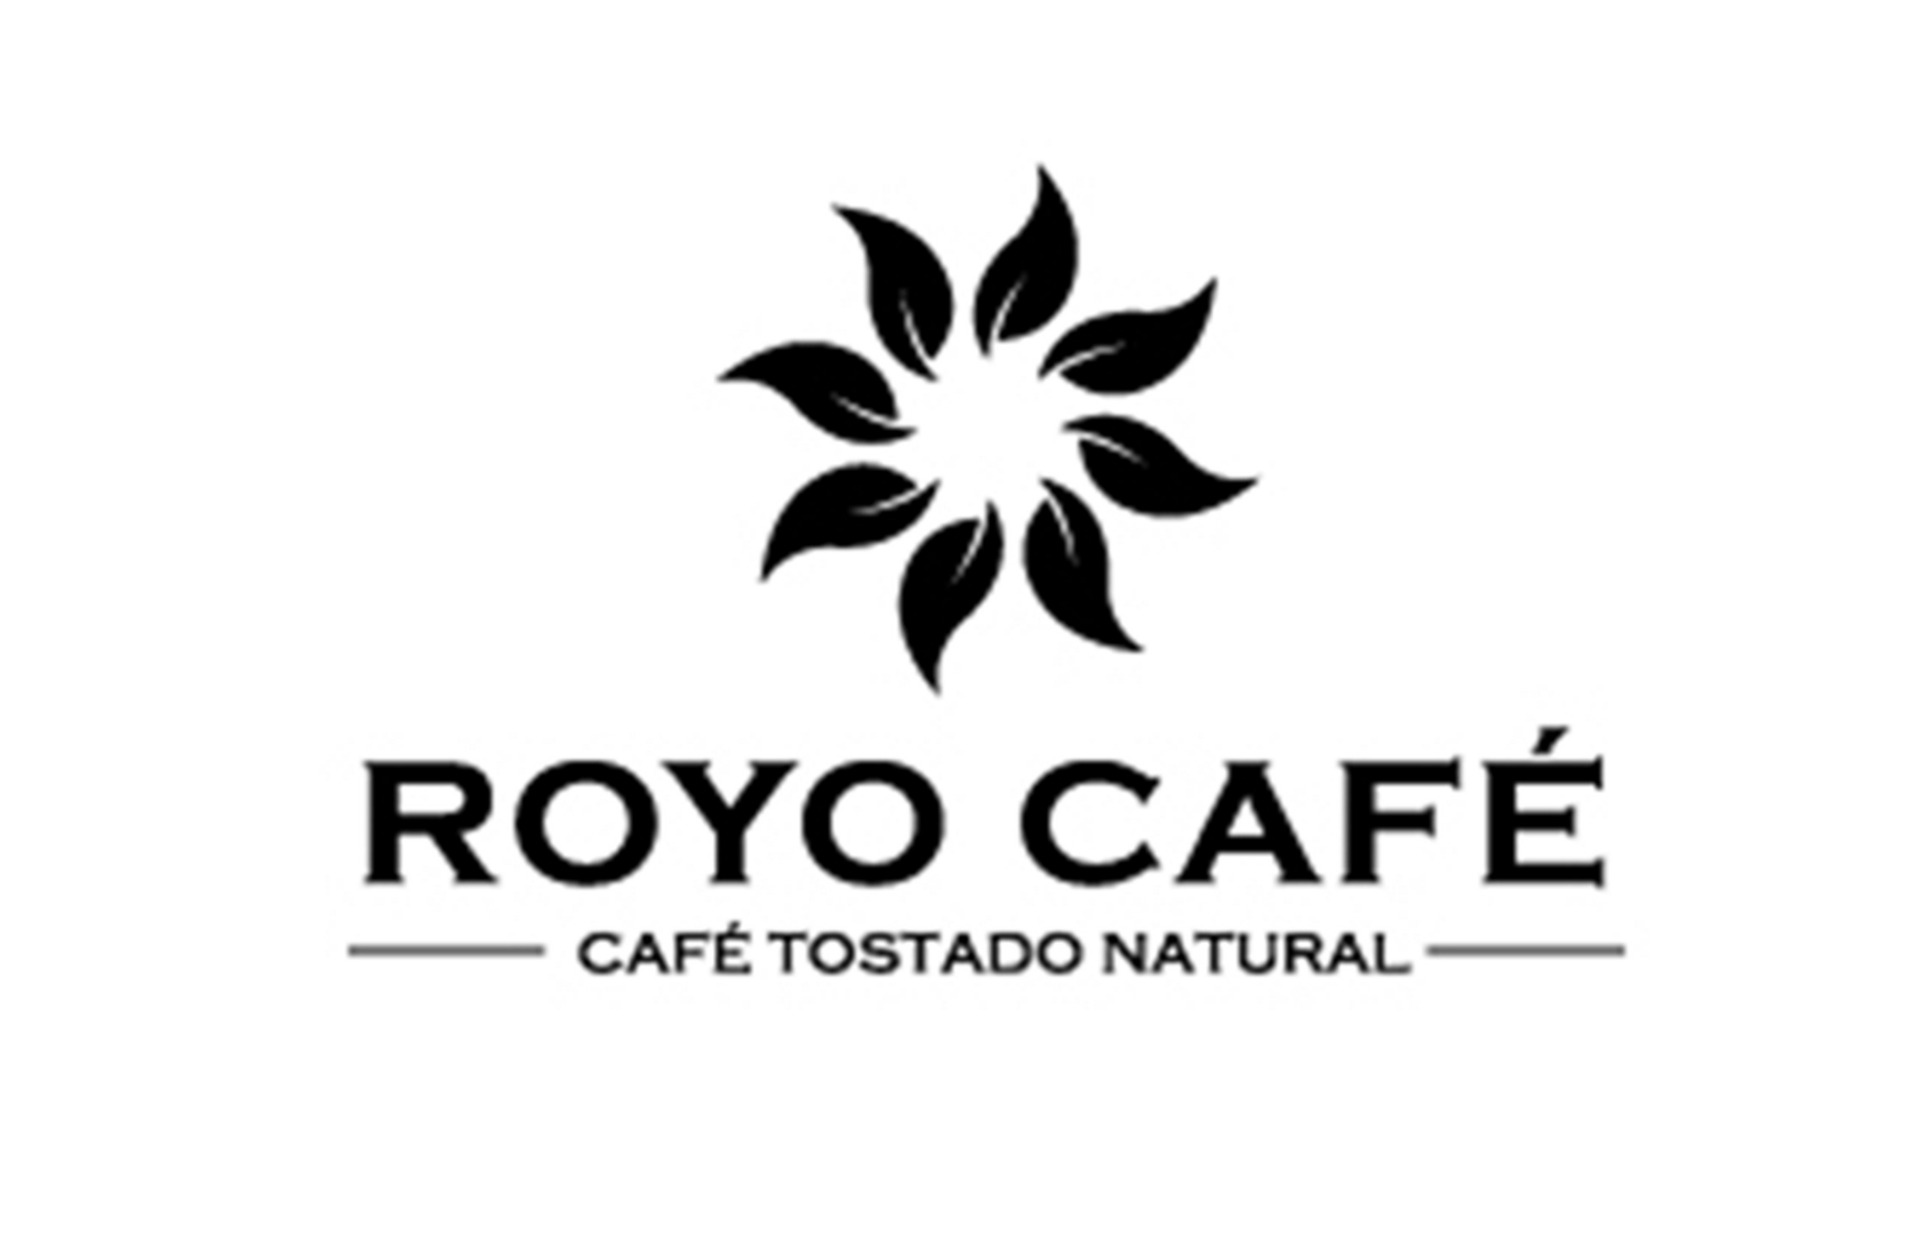 ROYO CAFE